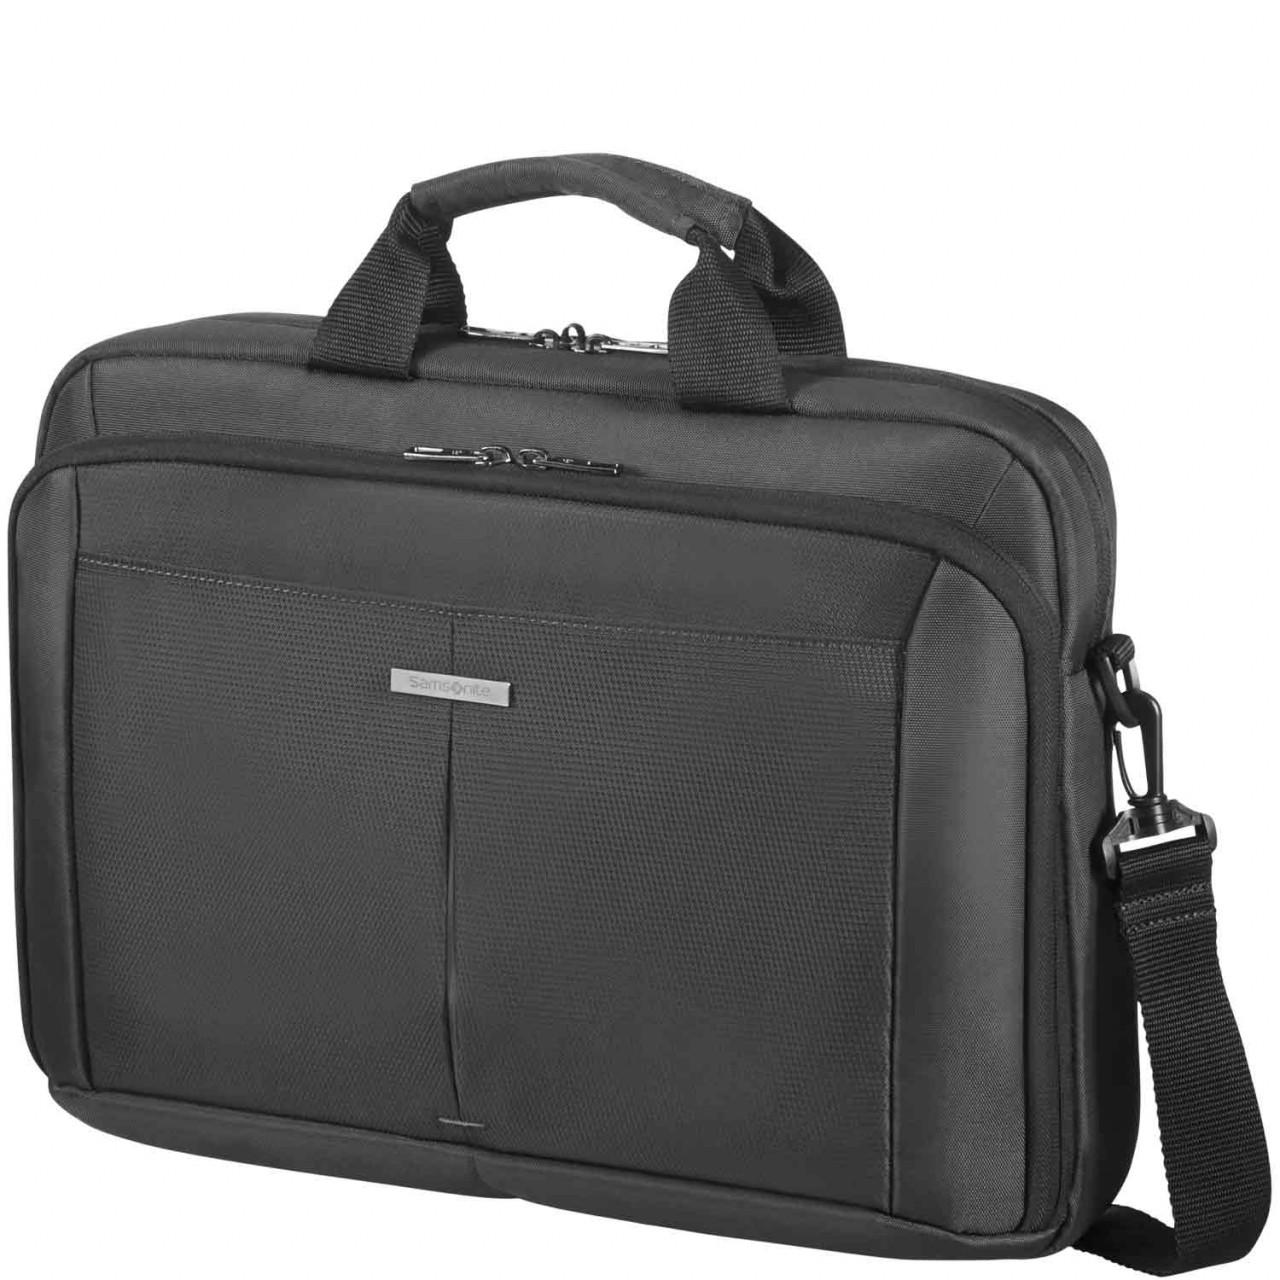 Samsonite Office Case 15,6 Zoll Laptoptasche Guardit 2.0 black